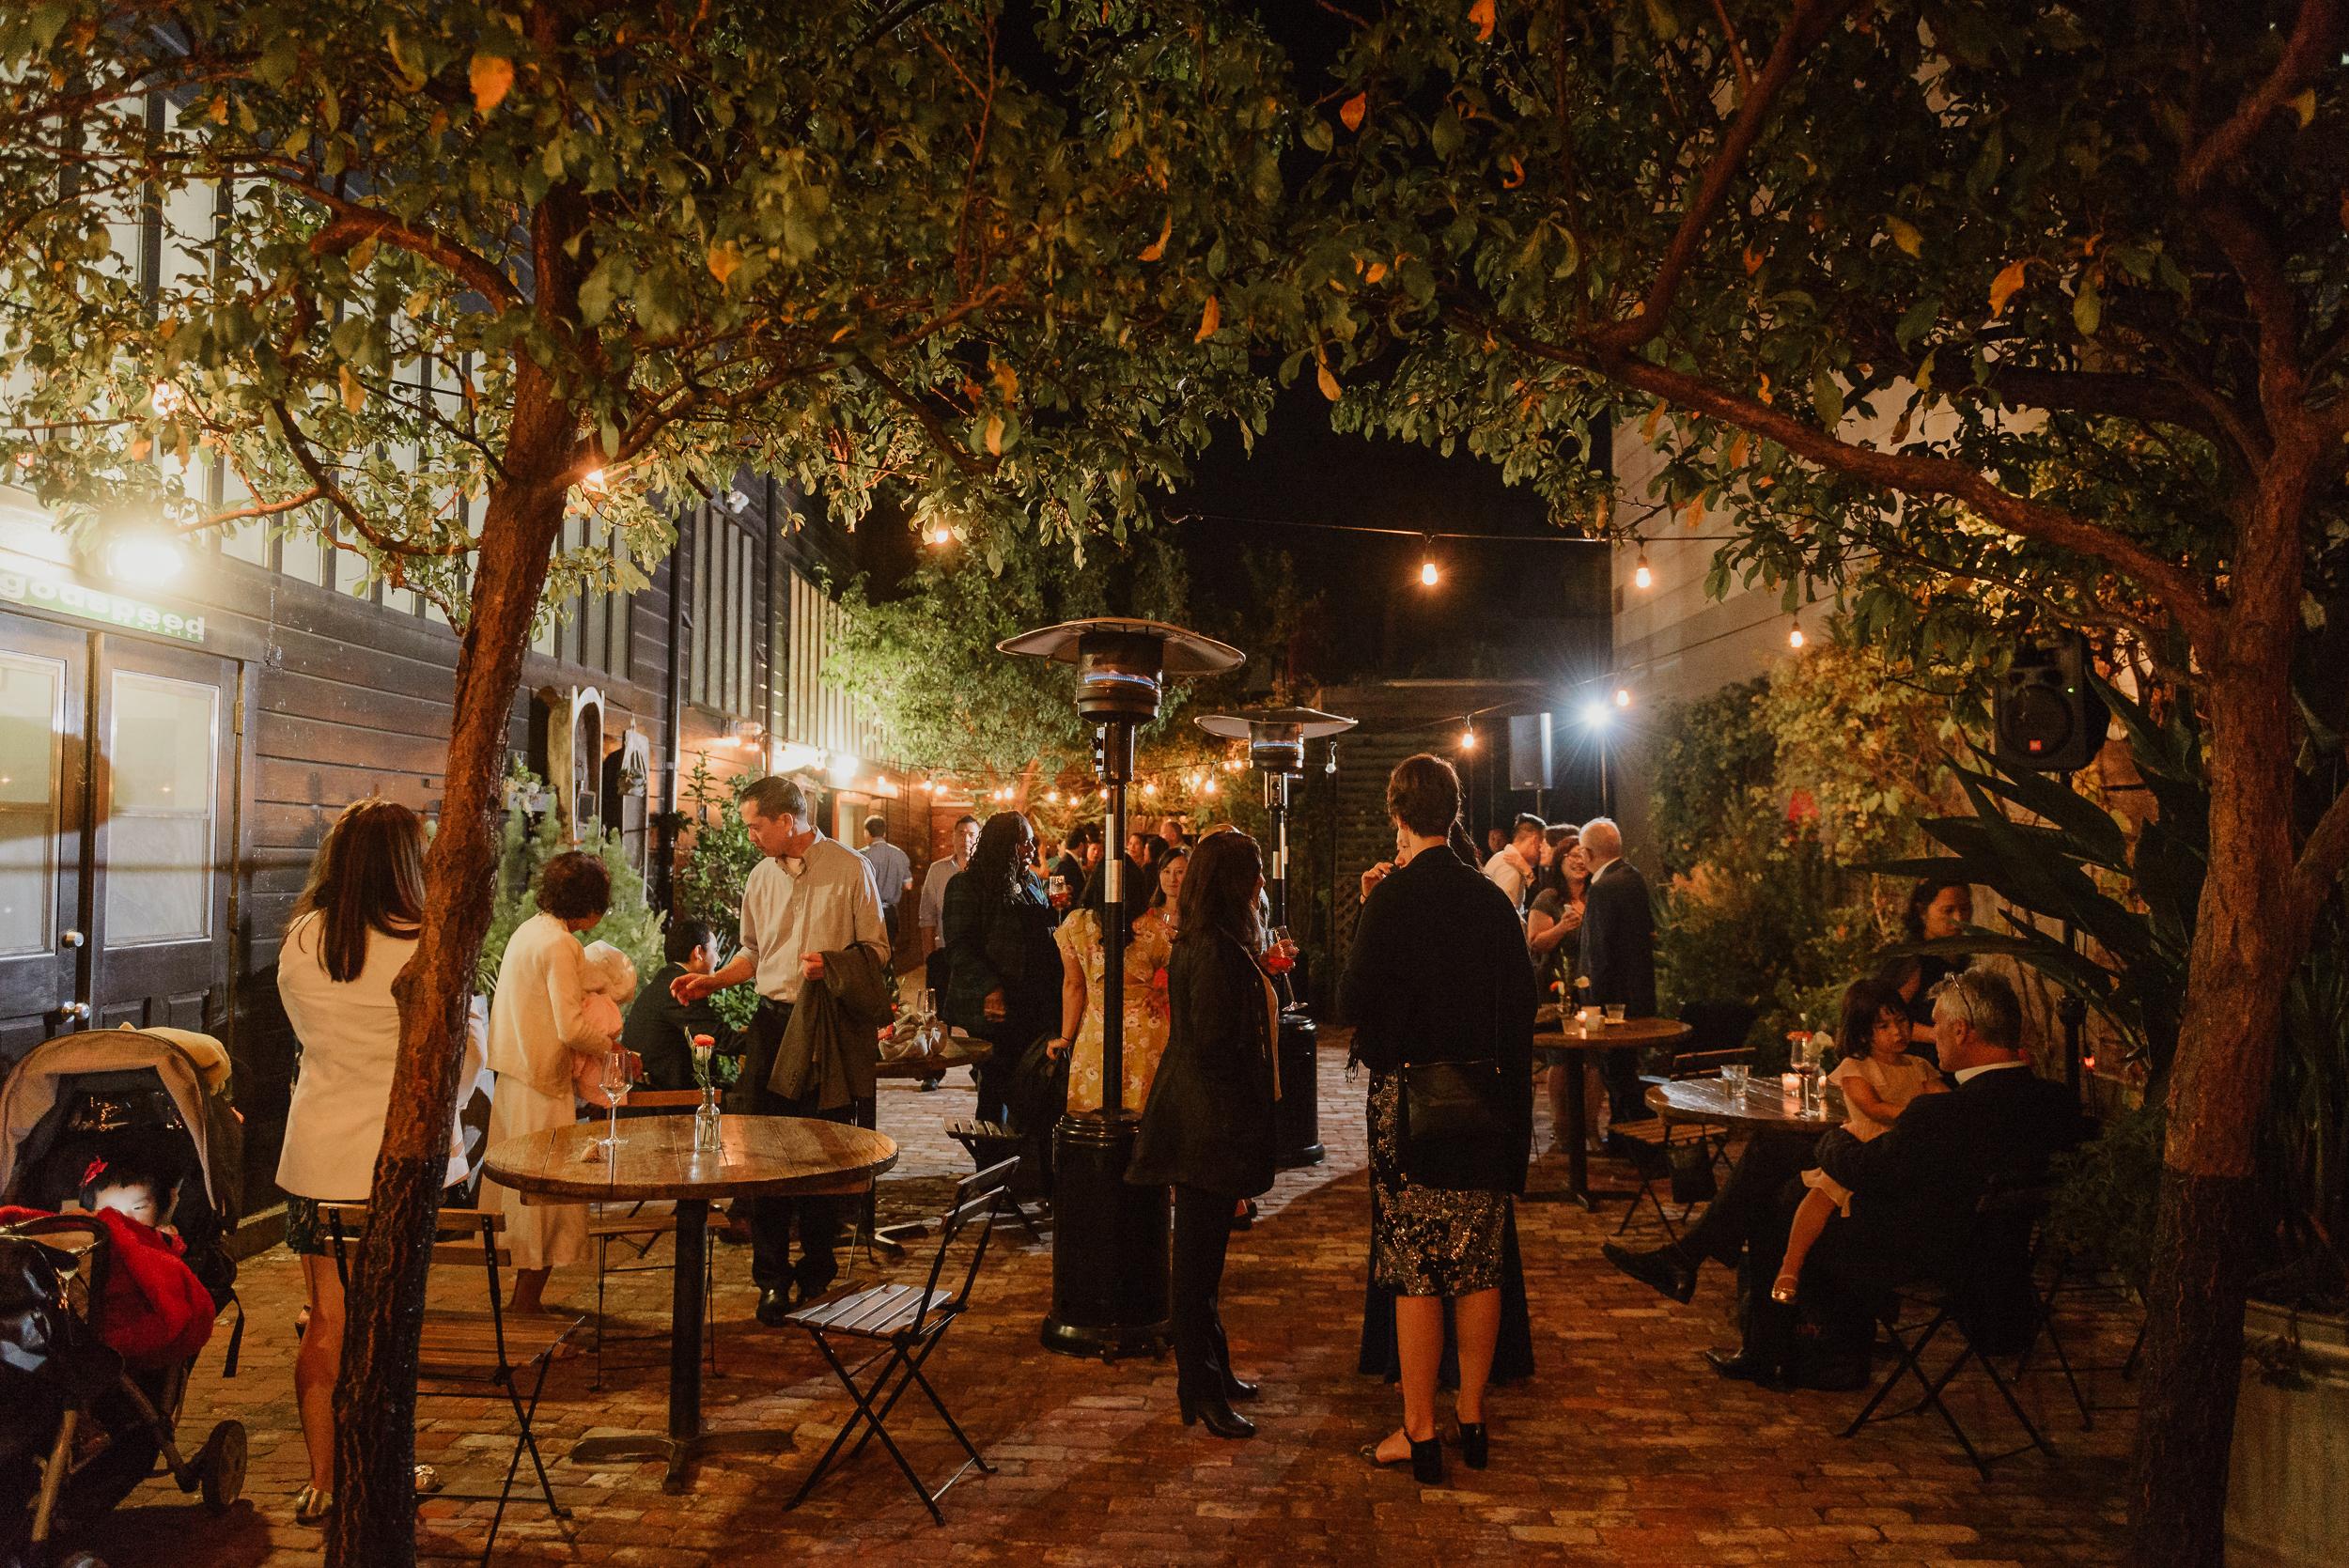 077-77-san-francisco-city-hall-stable-cafe-wedding-vivianchen-494.jpg